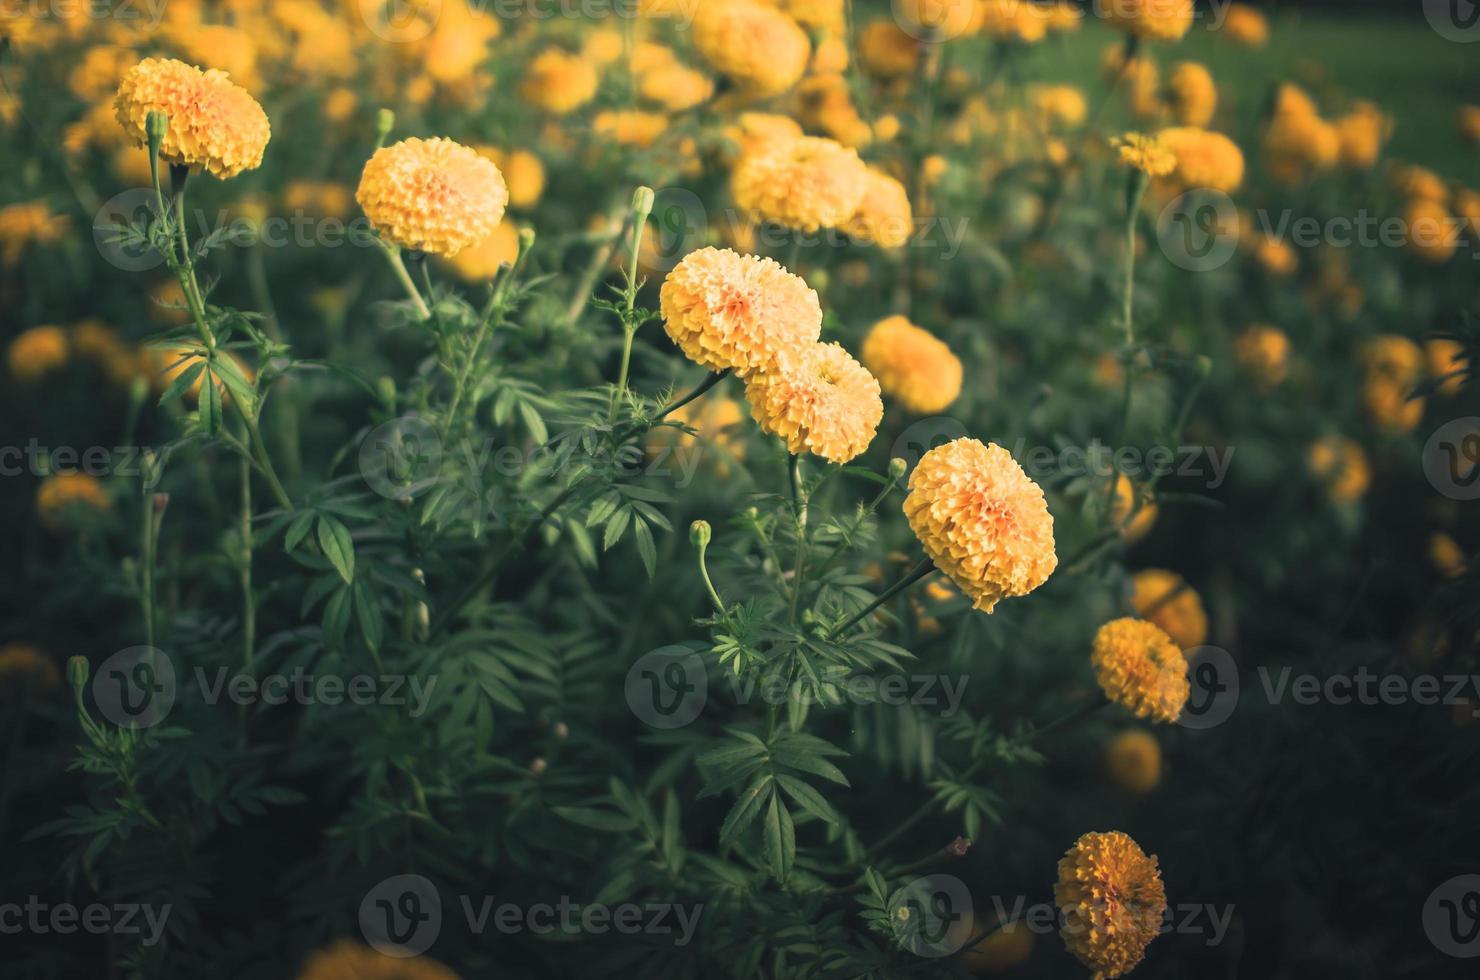 goudsbloemen of Afrikaantje erecta bloem vintage foto